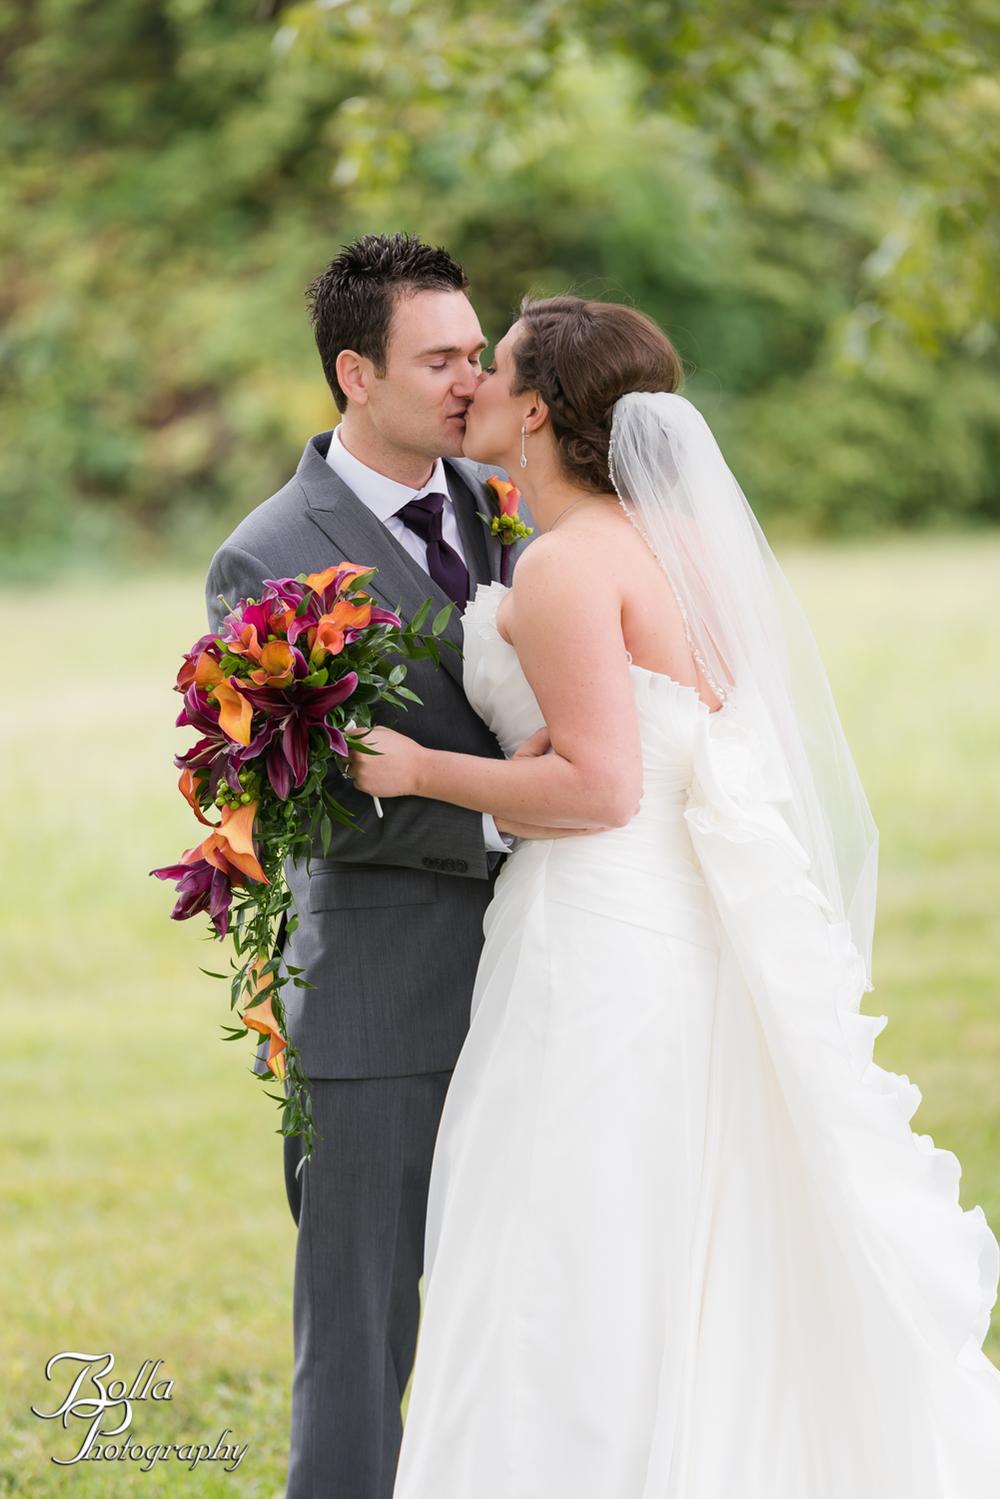 Bolla_Photography_St_Louis_wedding_photographer-0079.jpg